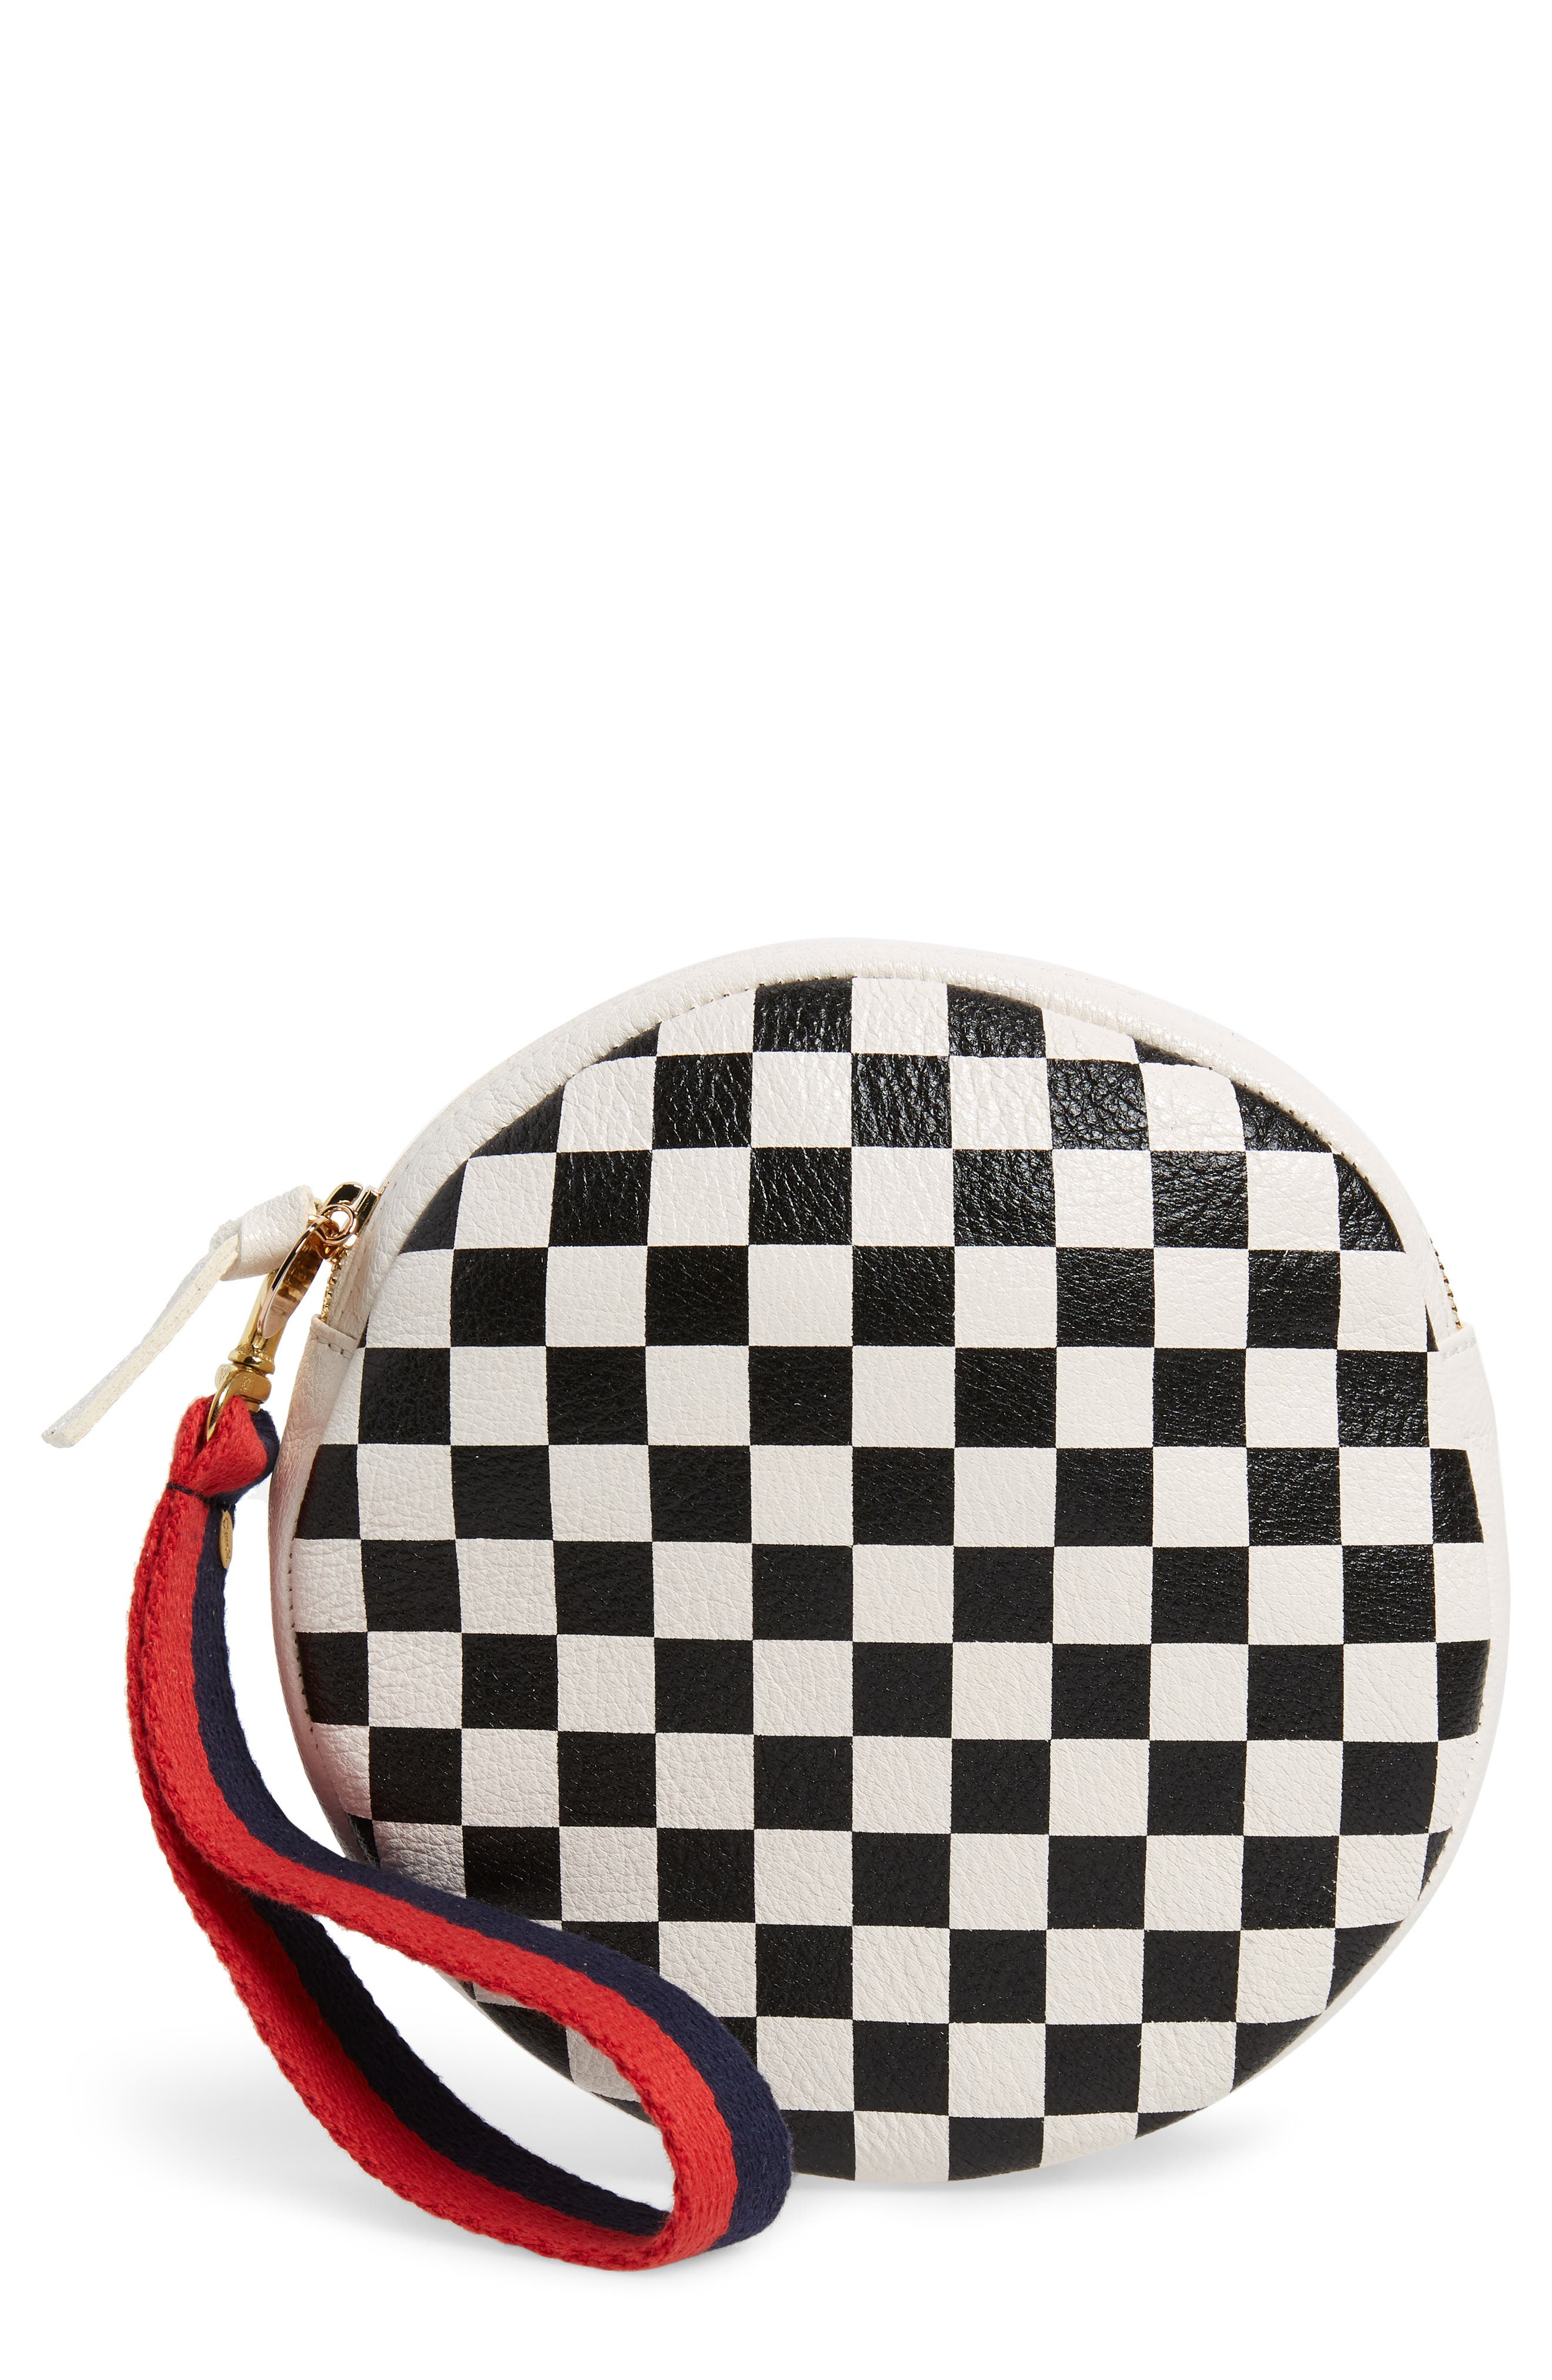 Checkered Leather Circle Clutch,                         Main,                         color, Cream/ Black Checker